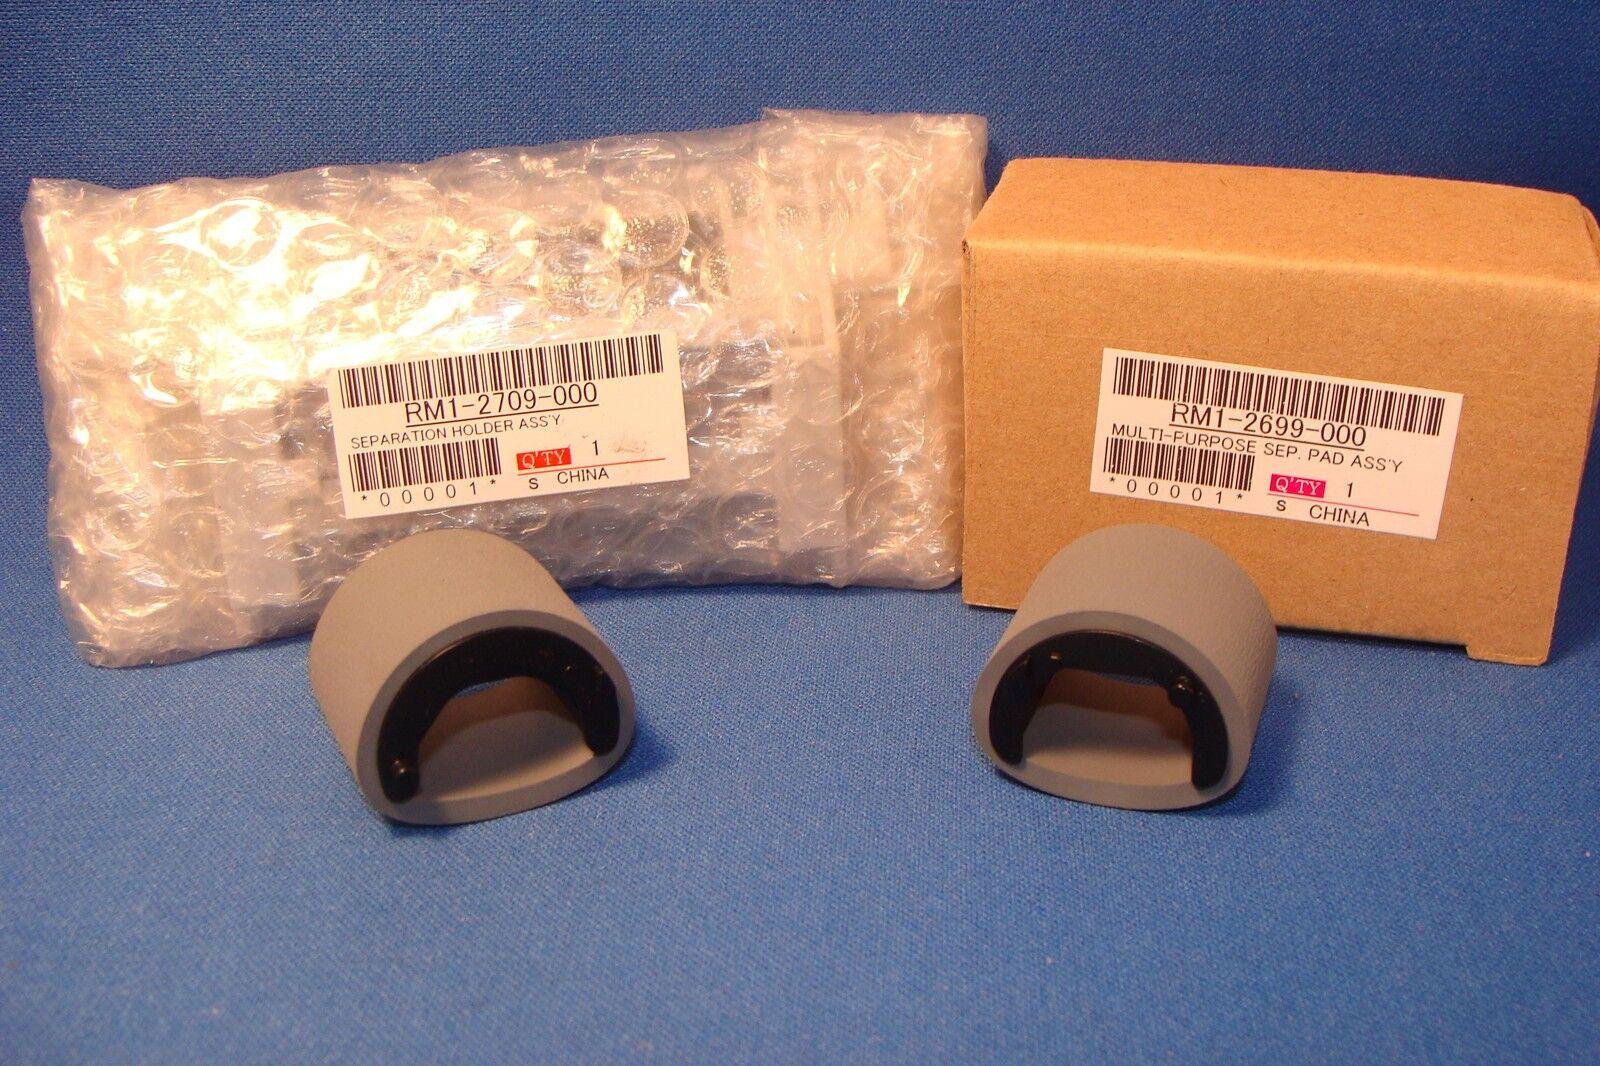 RM1-2702, RM1-2709, RM1-2741, RM1-2699 HP OEM 3000//3600//3800//CP3005 Feed Kit